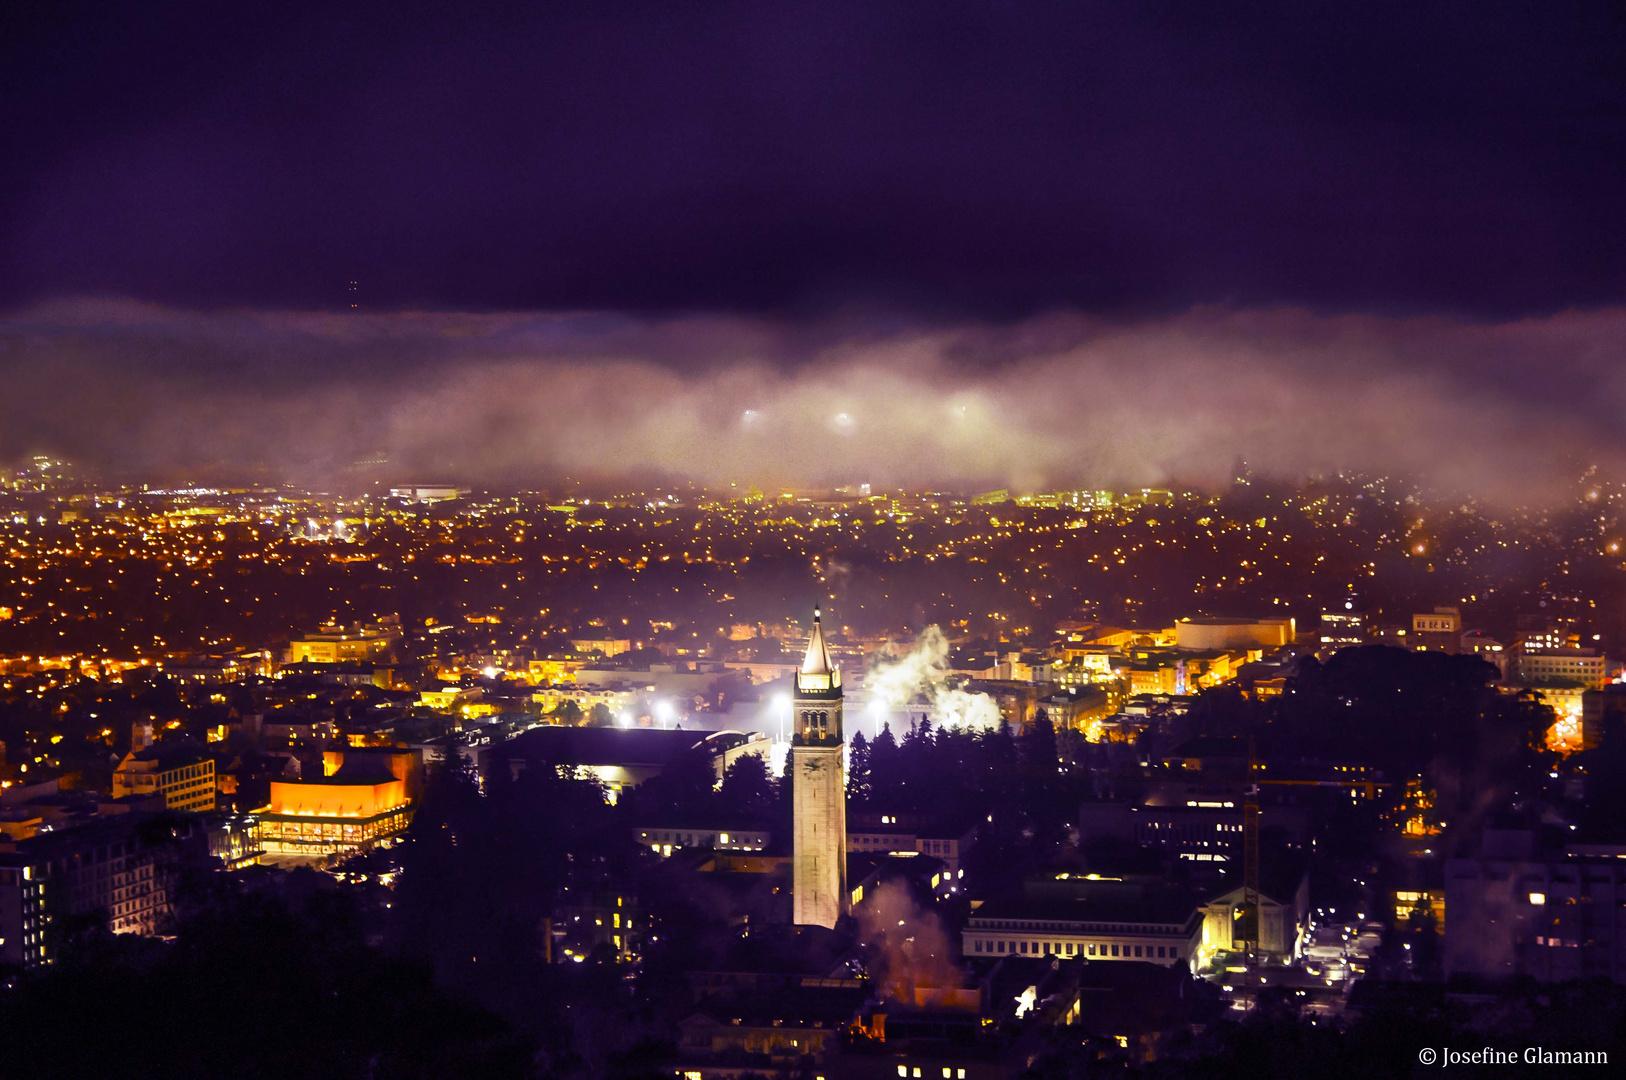 Night Clouds of Berkeley